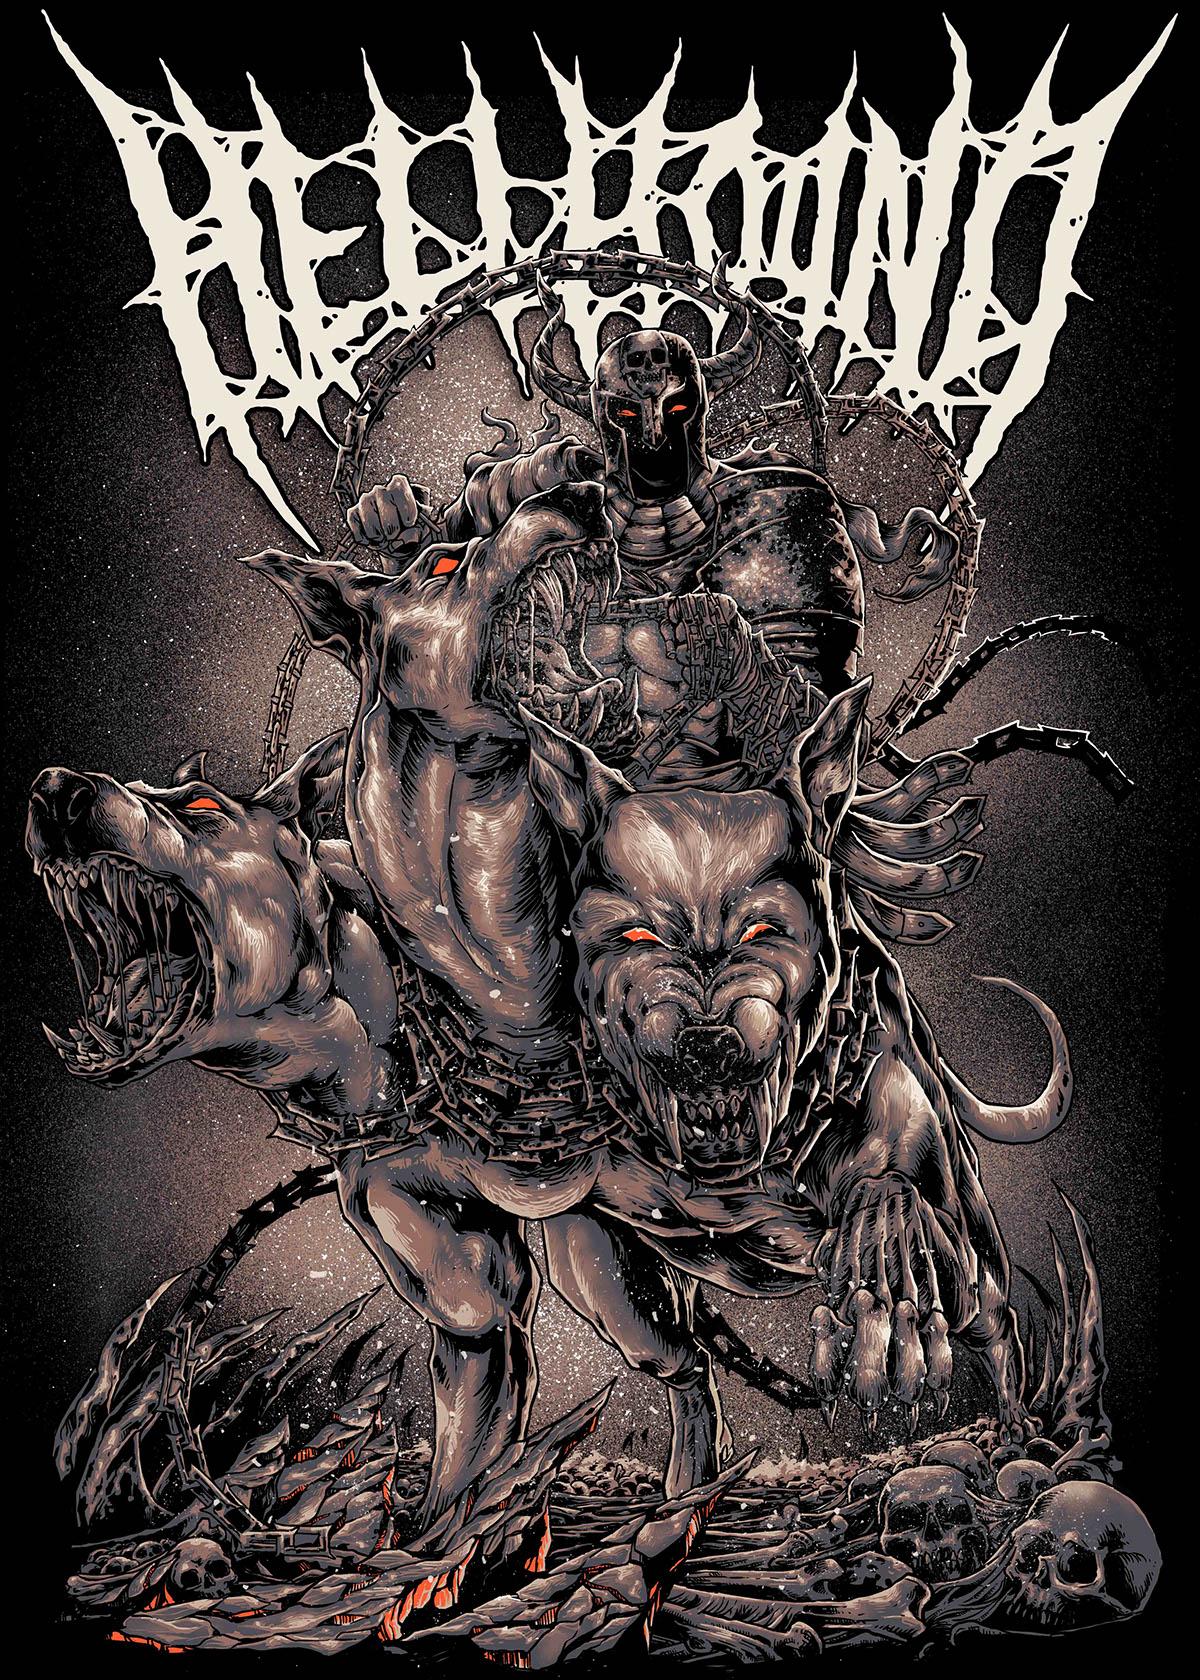 Death Metal Band Tees Artwork - Hellhound on Wacom Gallery